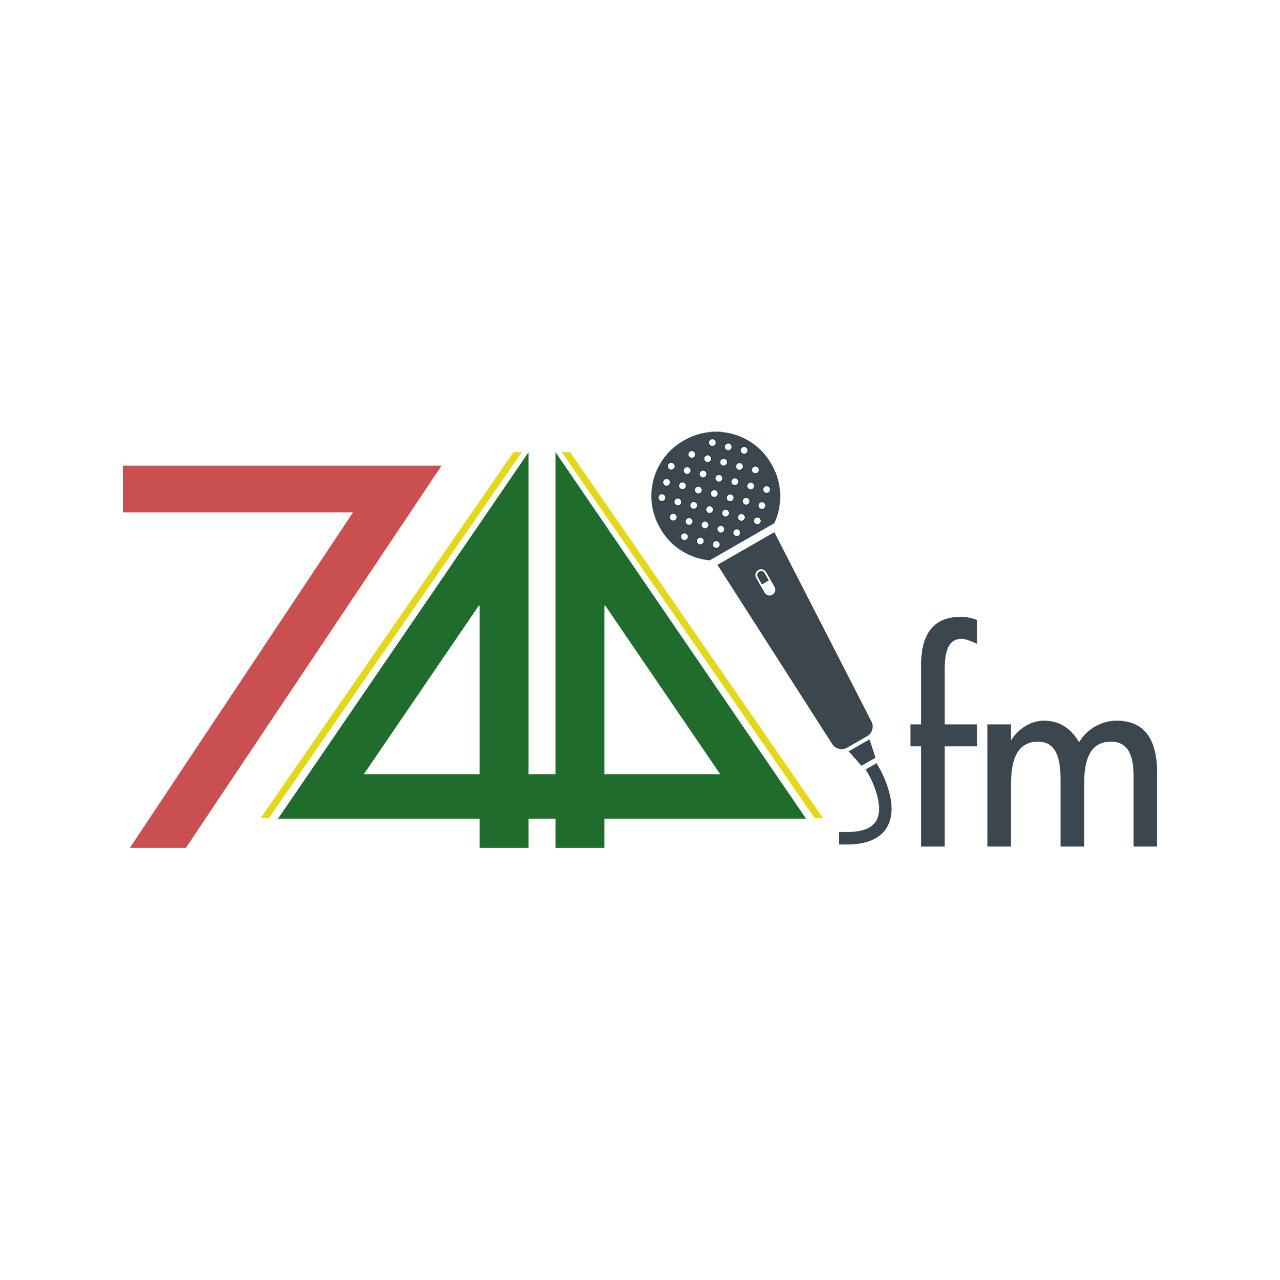 7441 FM